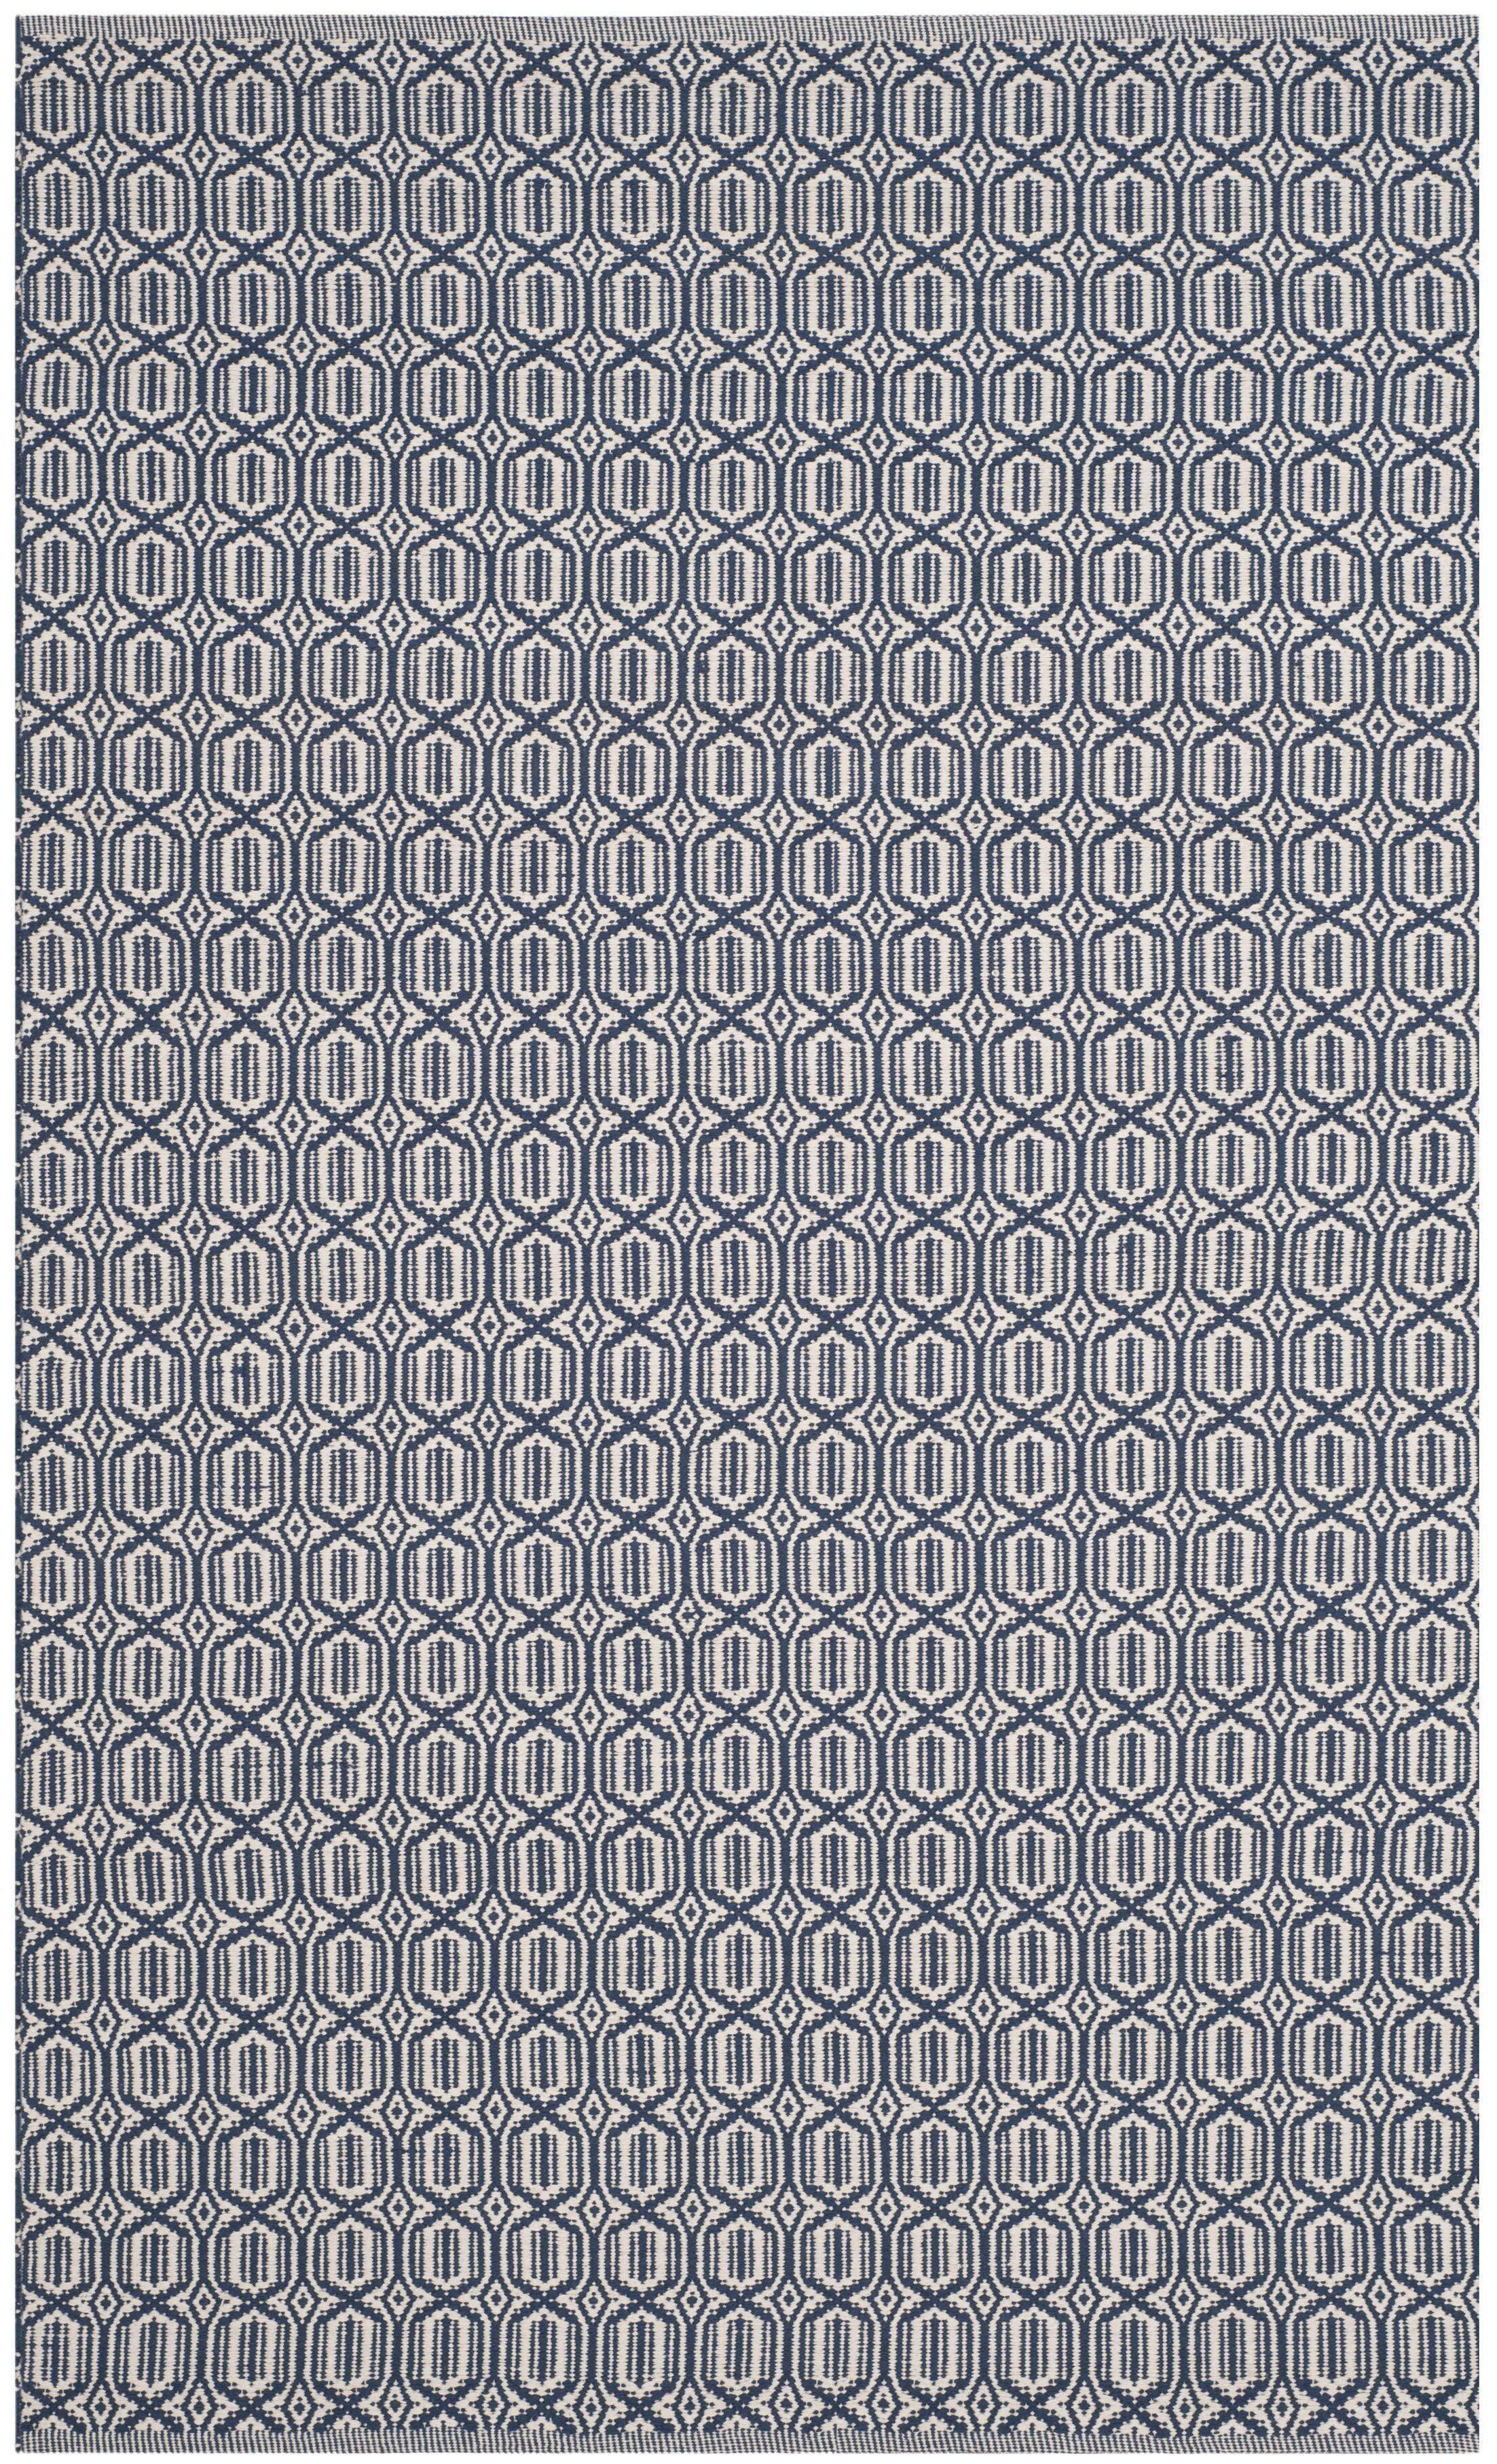 Parthena Hand-Woven Gray Area Rug Rug Size: Rectangle 6' x 9'